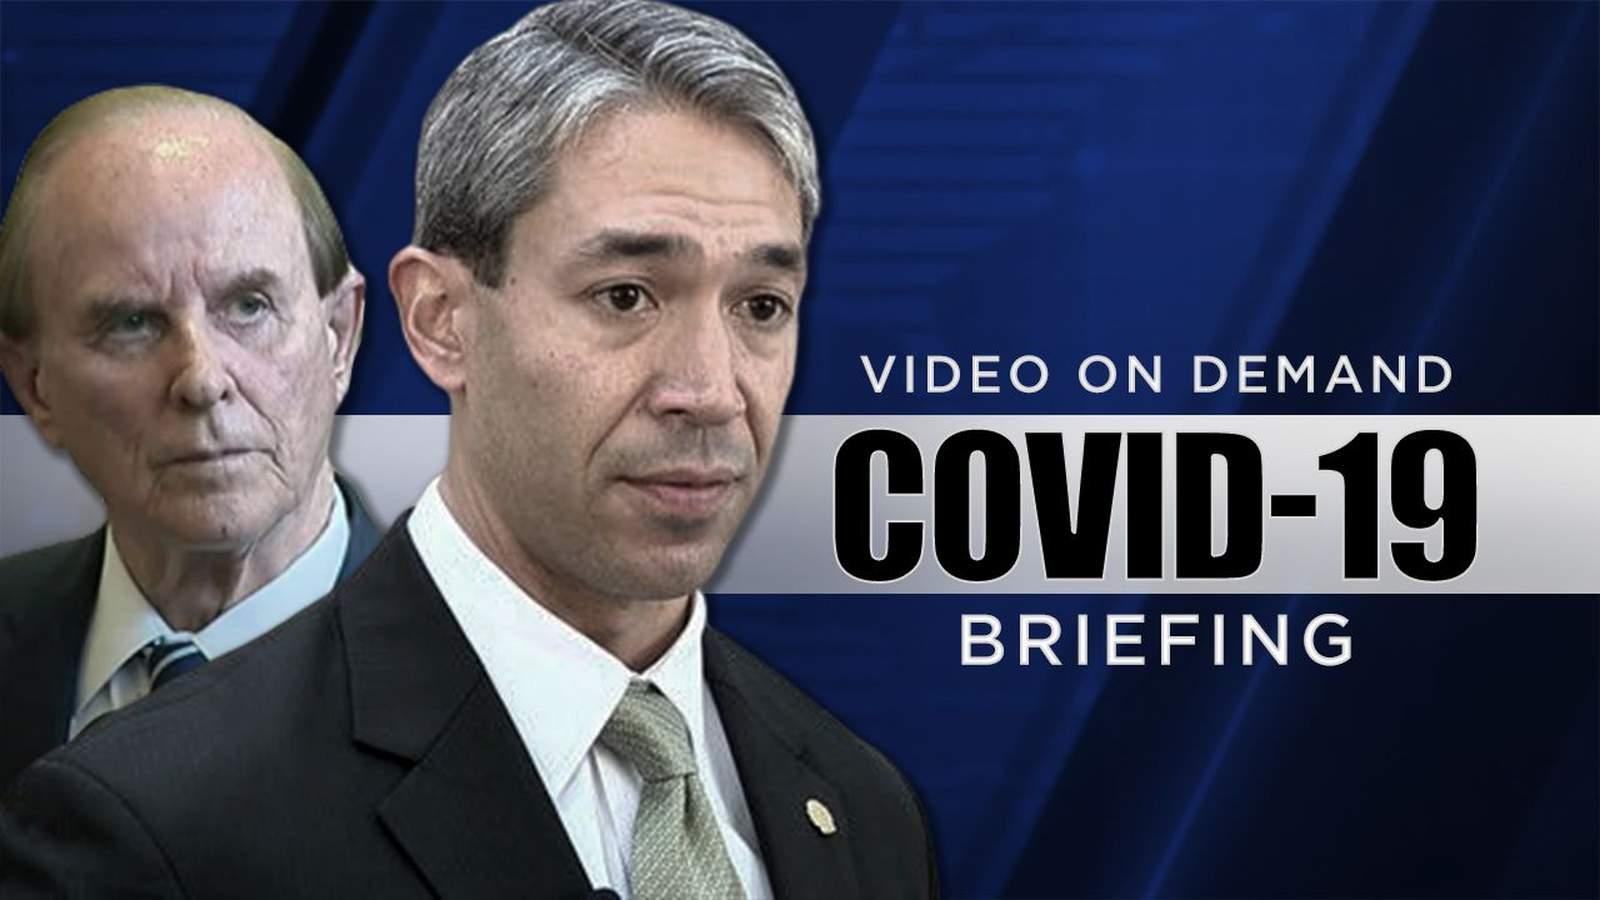 Coronavirus/utilities update Feb. 20: 615 COVID-19 patients hospitalized; SAWS says boil notice lifted for parts of San Antonio - KSAT San Antonio